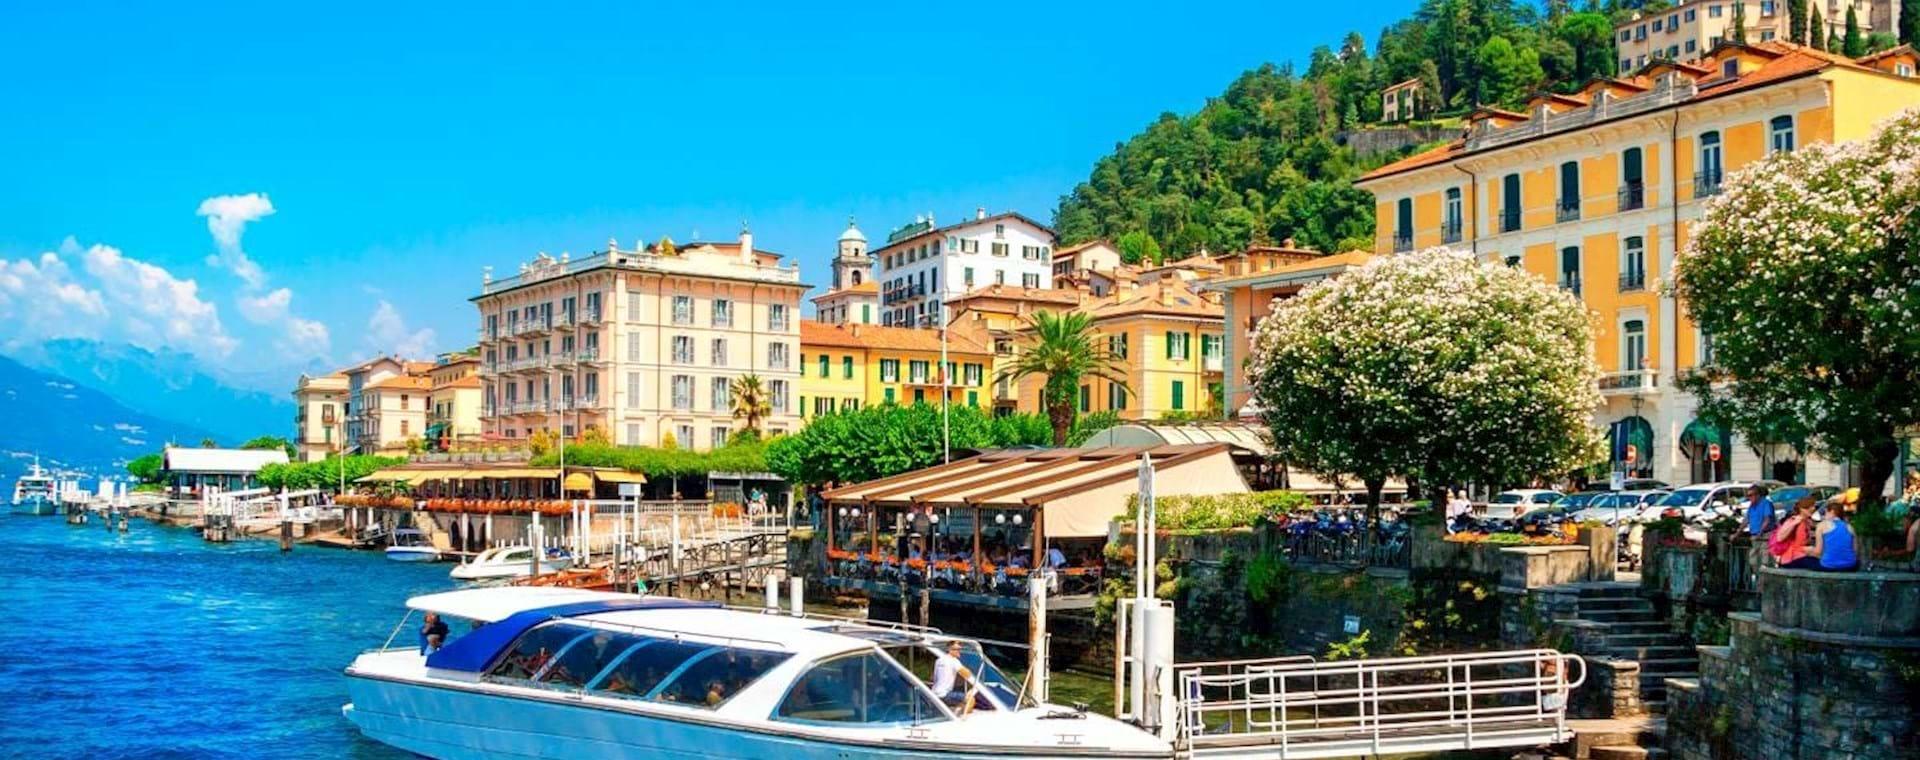 Lake Como, Bellagio, and Lugano Switzerland Day Trip from Milan